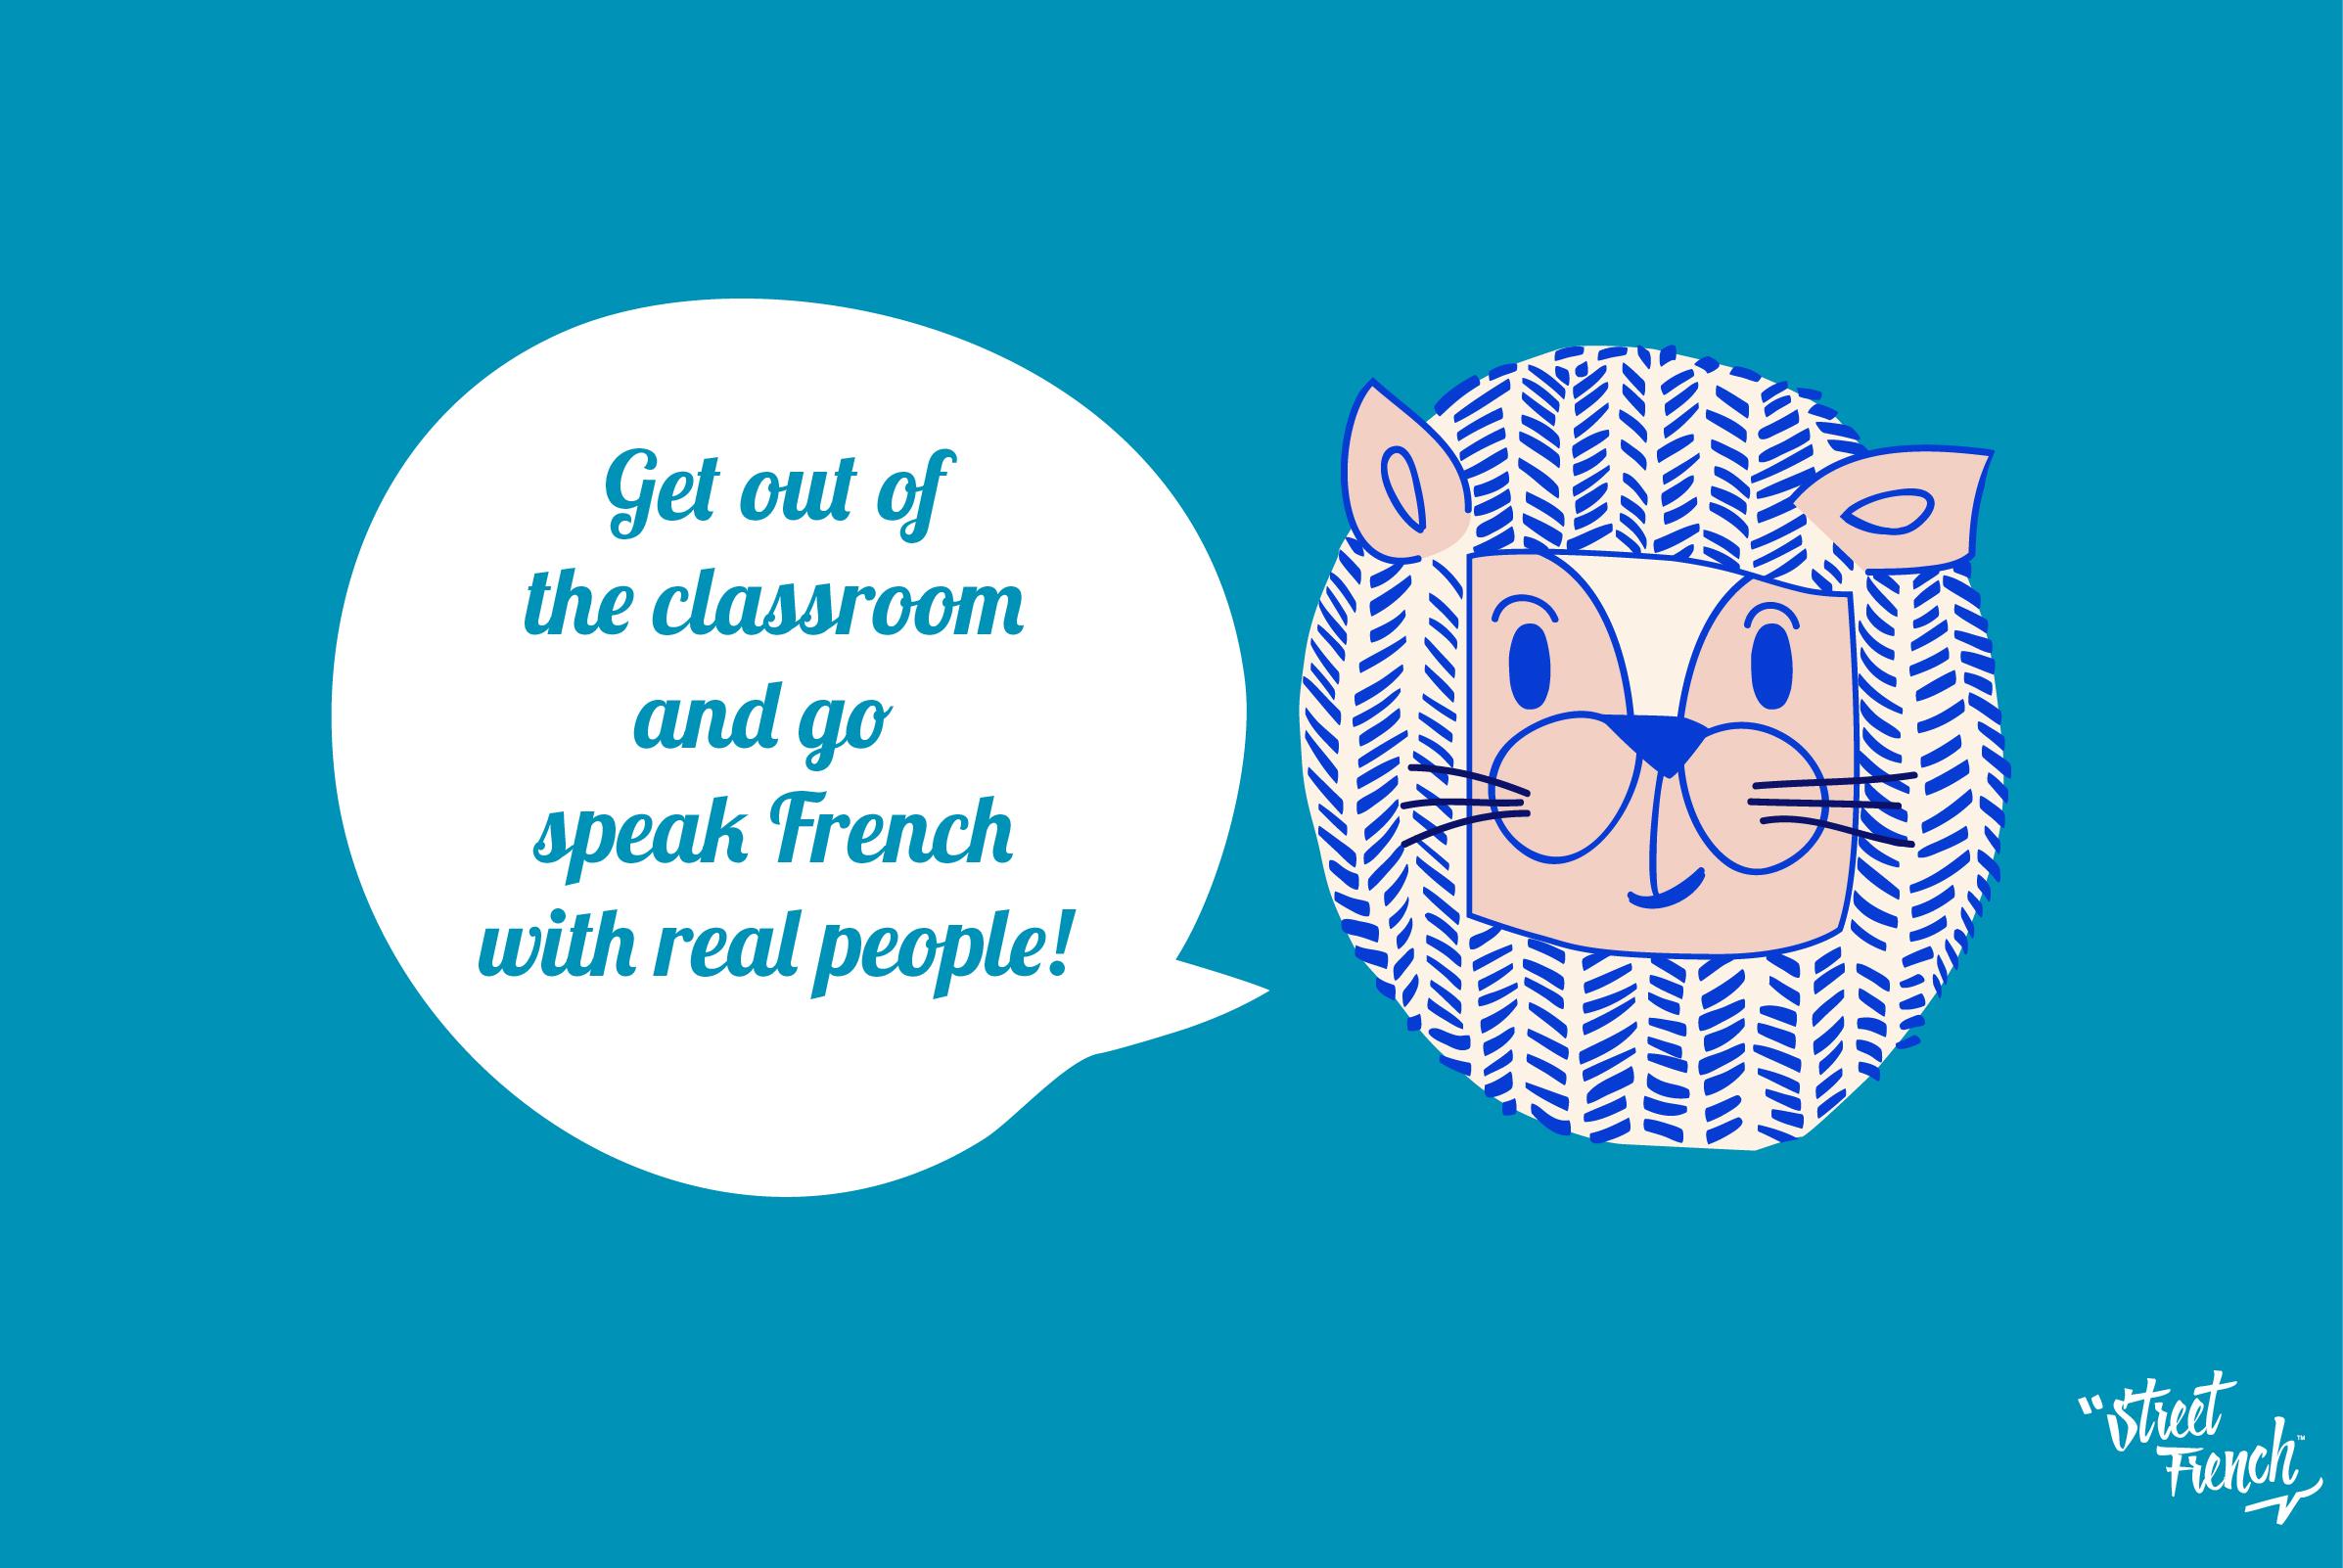 street-french-blog-french